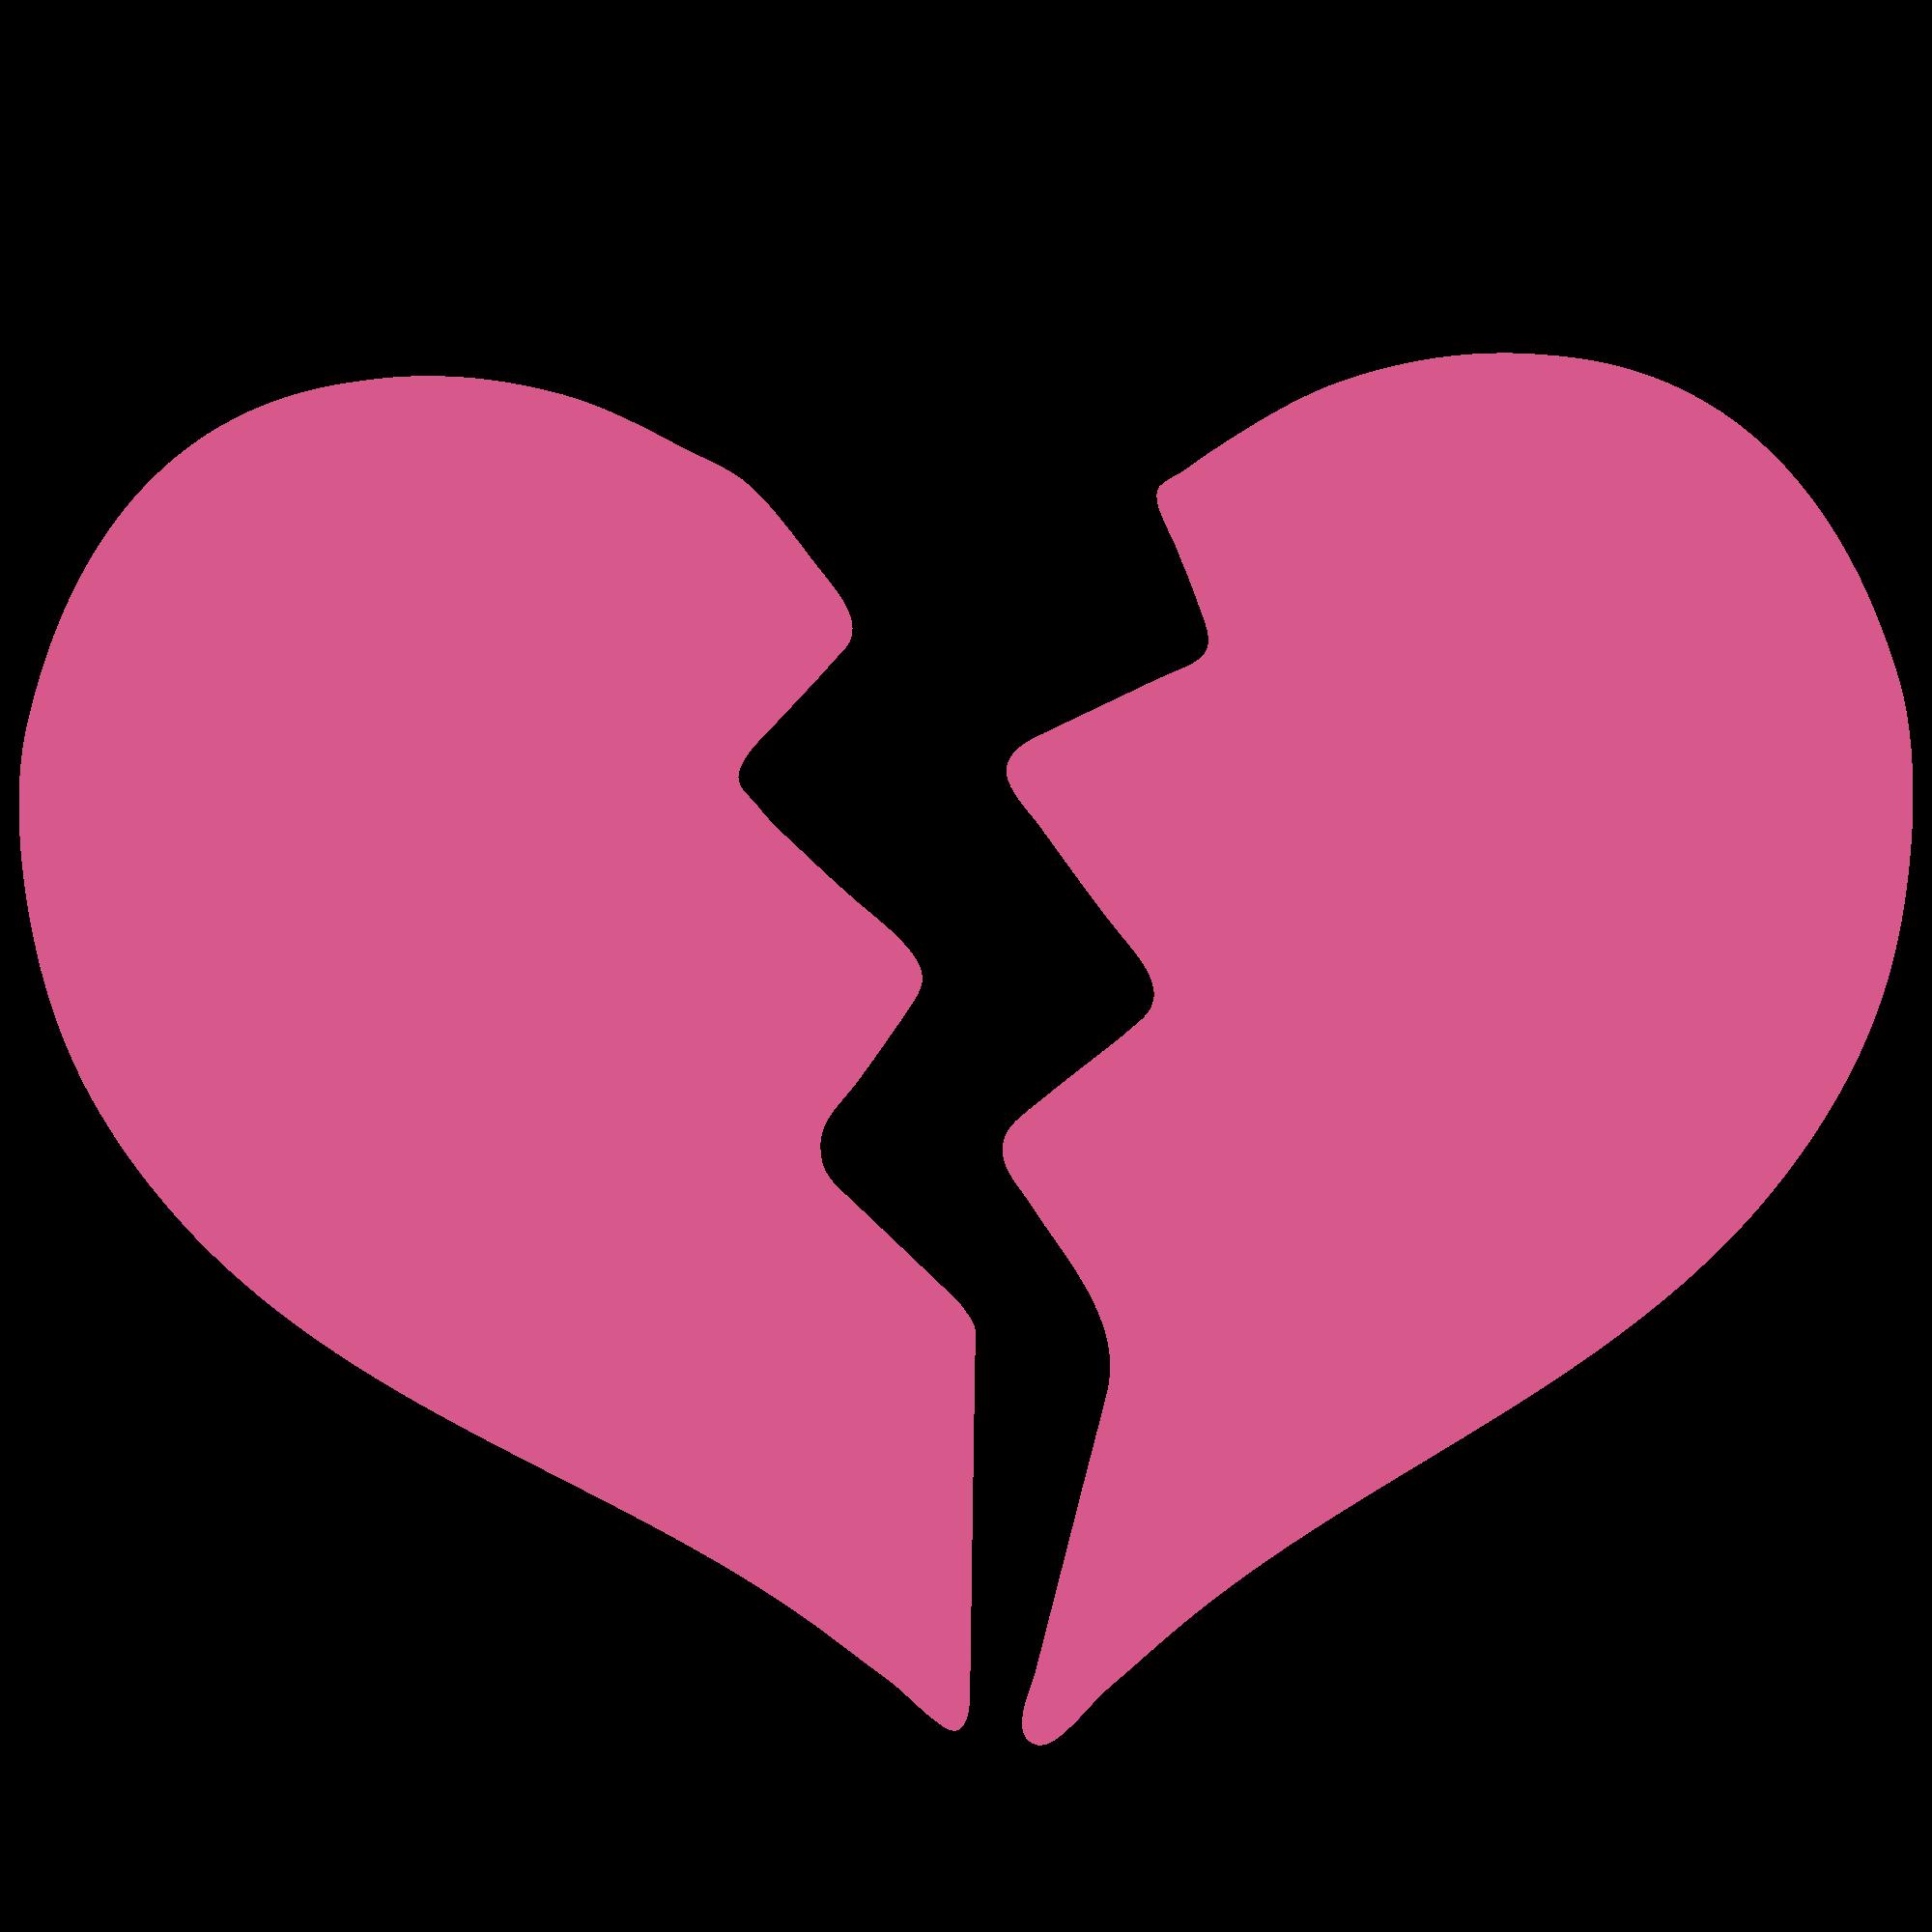 Emoji Heart Break Png